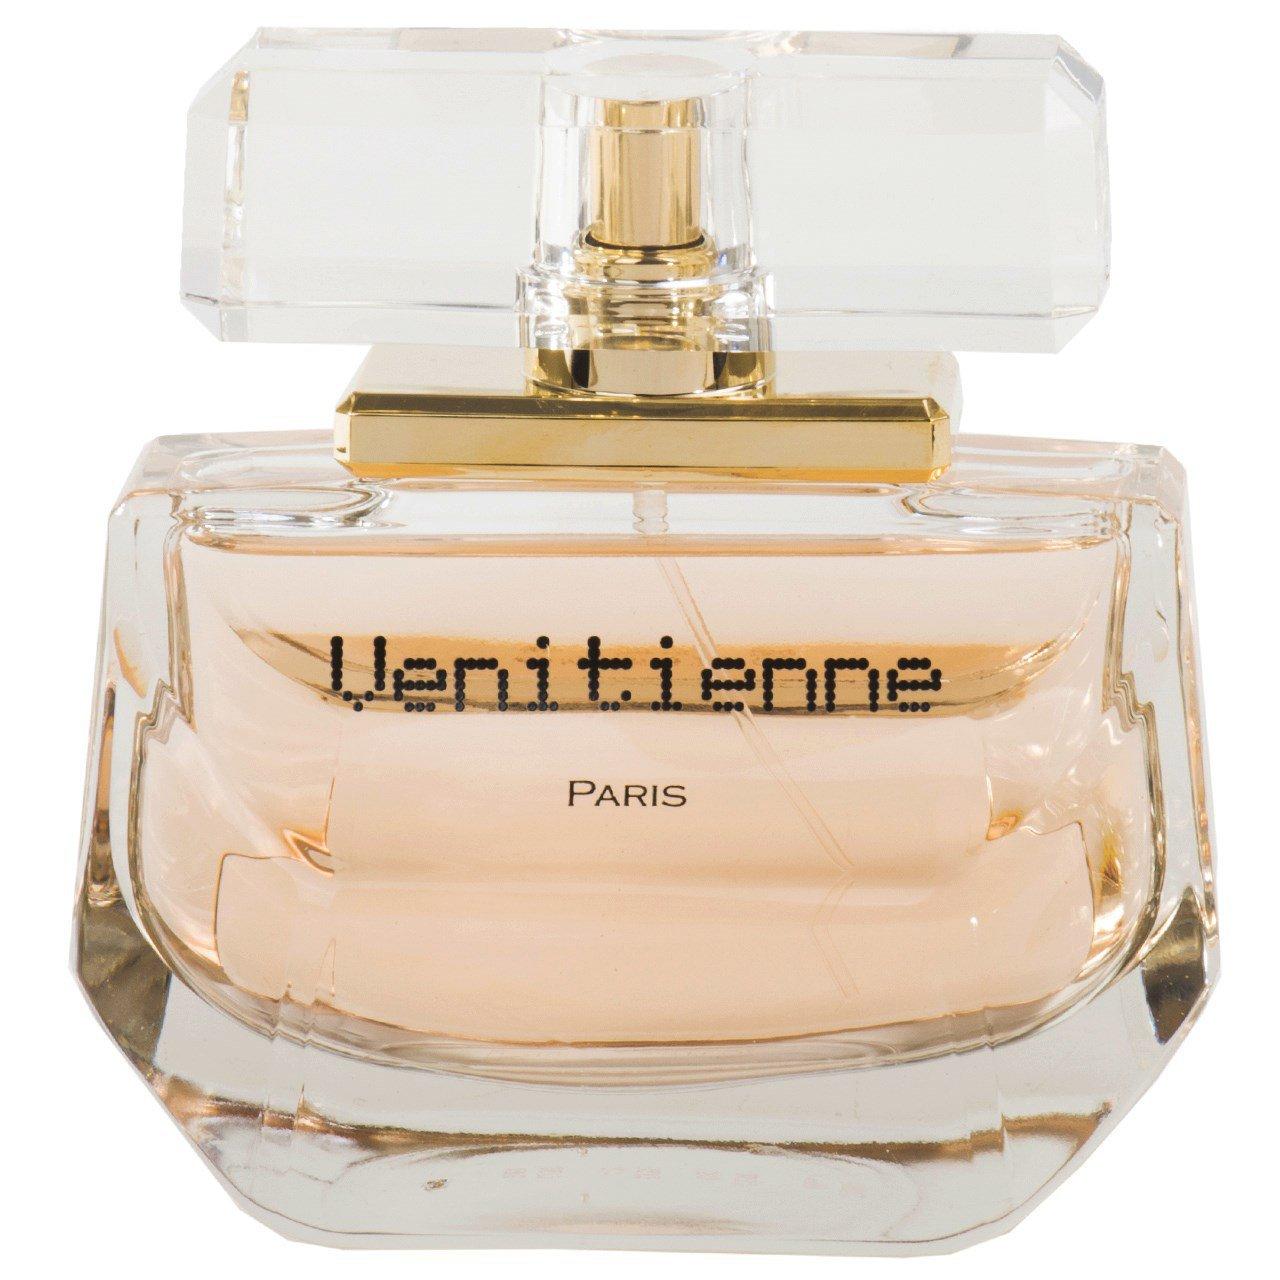 ادو پرفیوم زنانه ایو د سیستل مدل Venitienne paris حجم 100 میلی لیتر